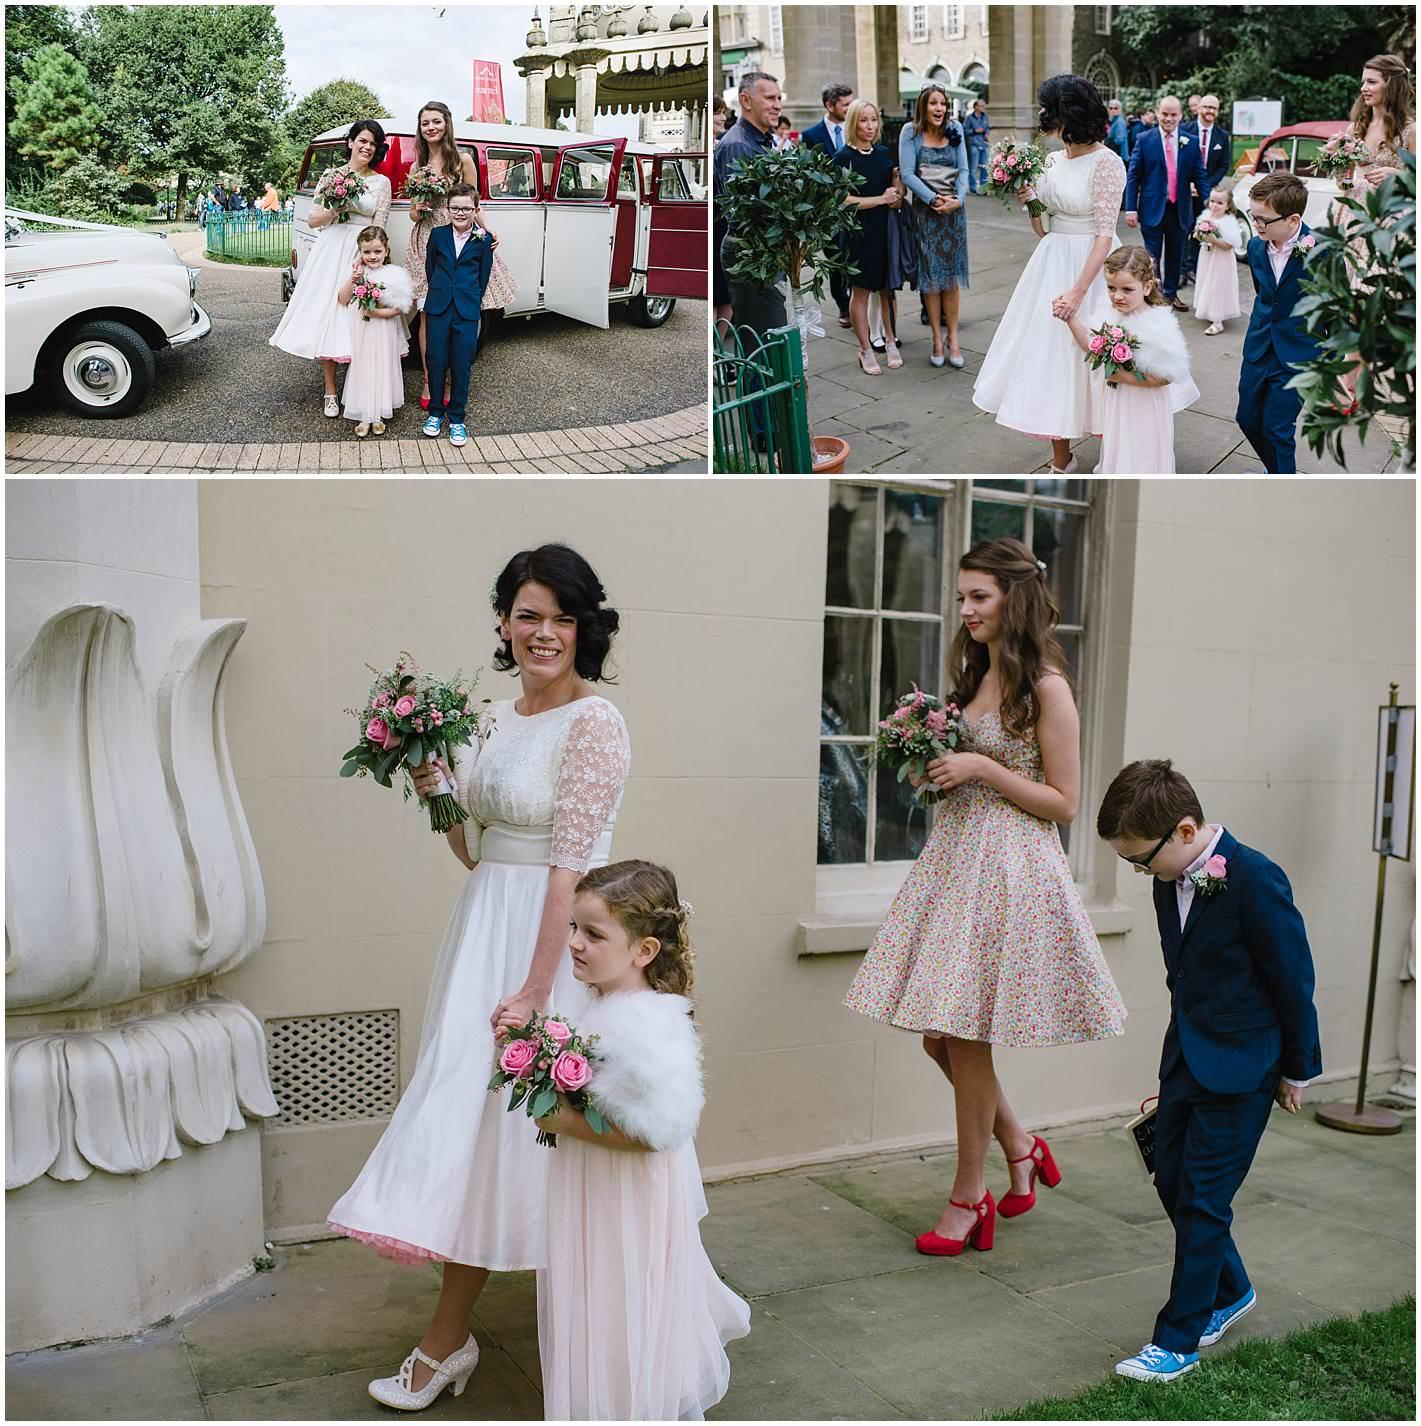 royal-pavilion-wedding-brighton375